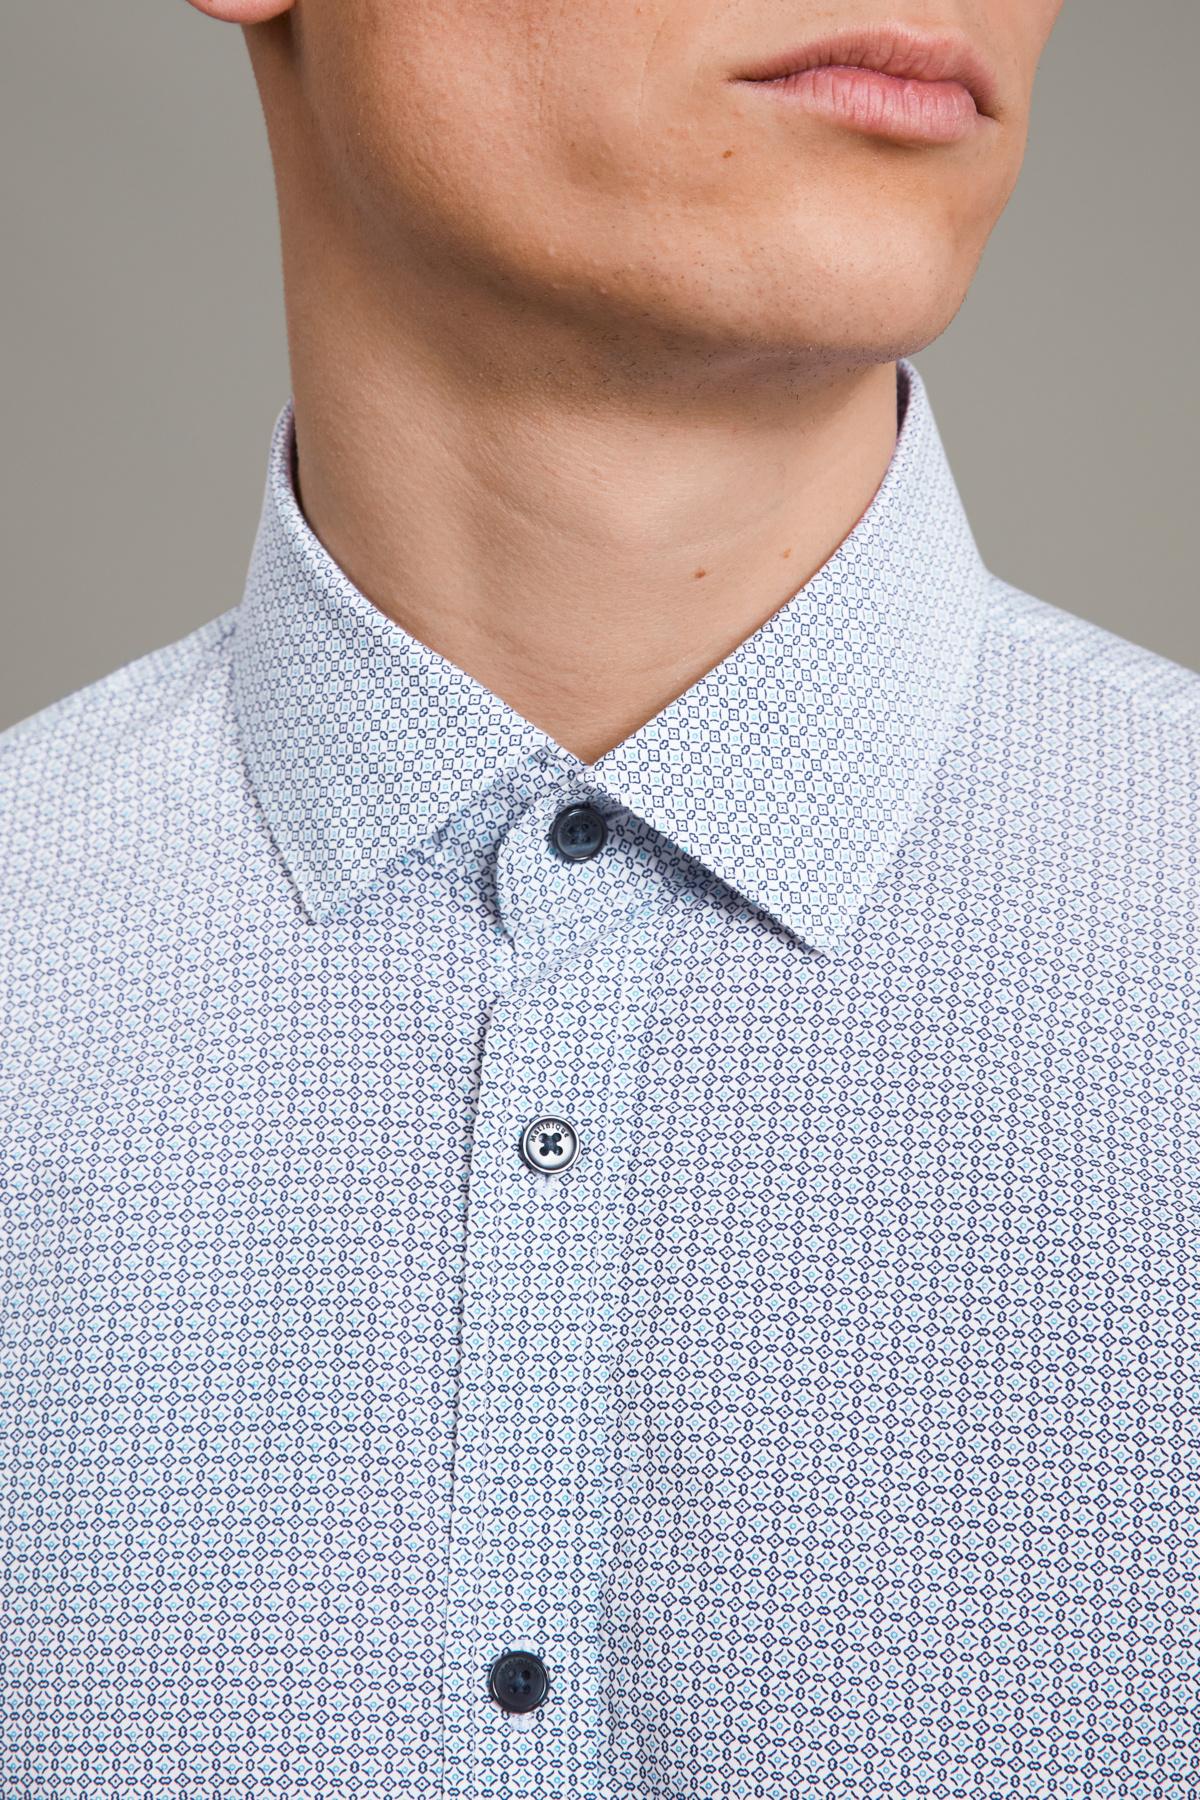 Trostol Short Sleeve Dress Shirt - Chambray Blue